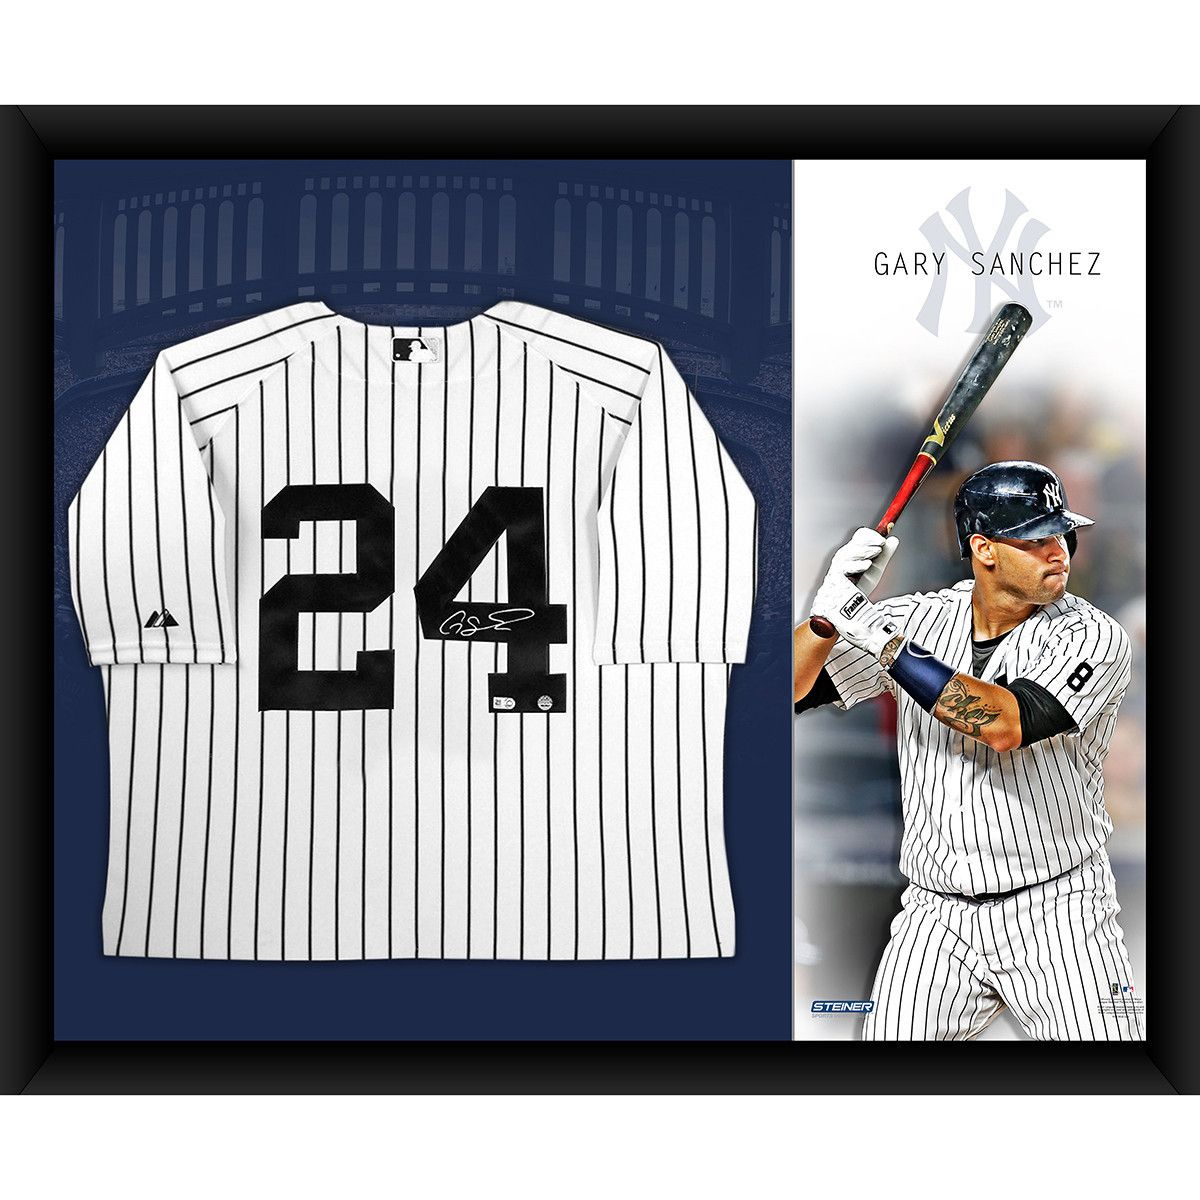 GARY SANCHEZ Signed New York Yankees Home Jersey Framed 32x40 w/ Canvas  Background STEINER -